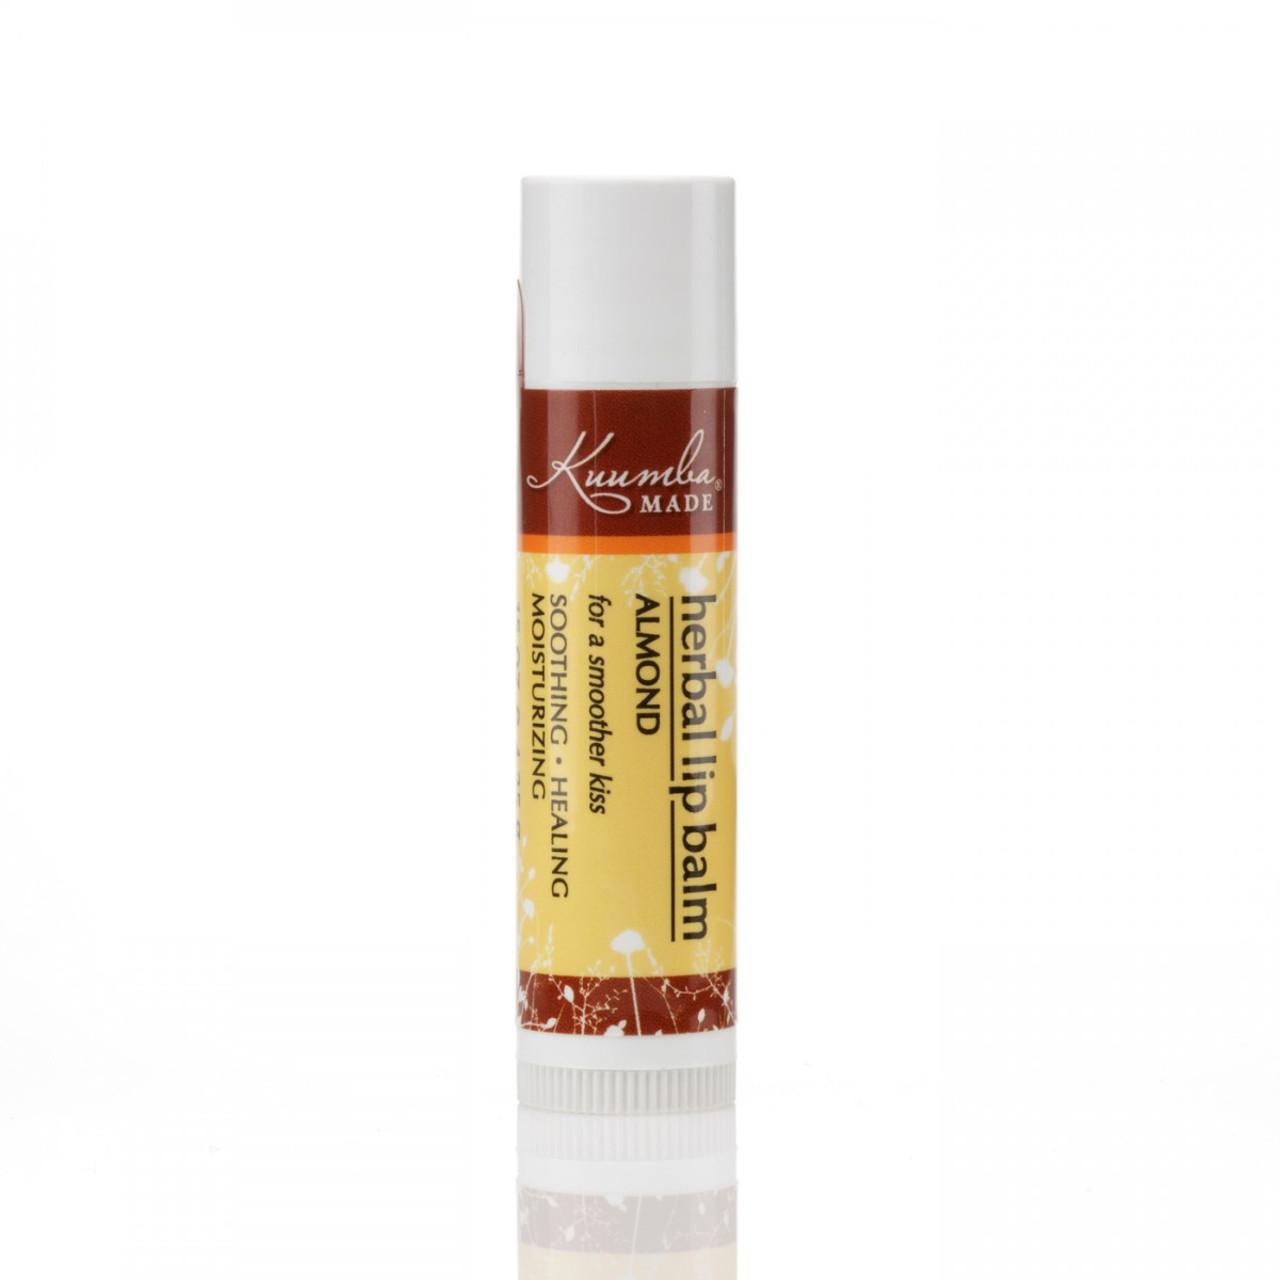 Kuumba Made Almond Flavoured Organic Lip Balm